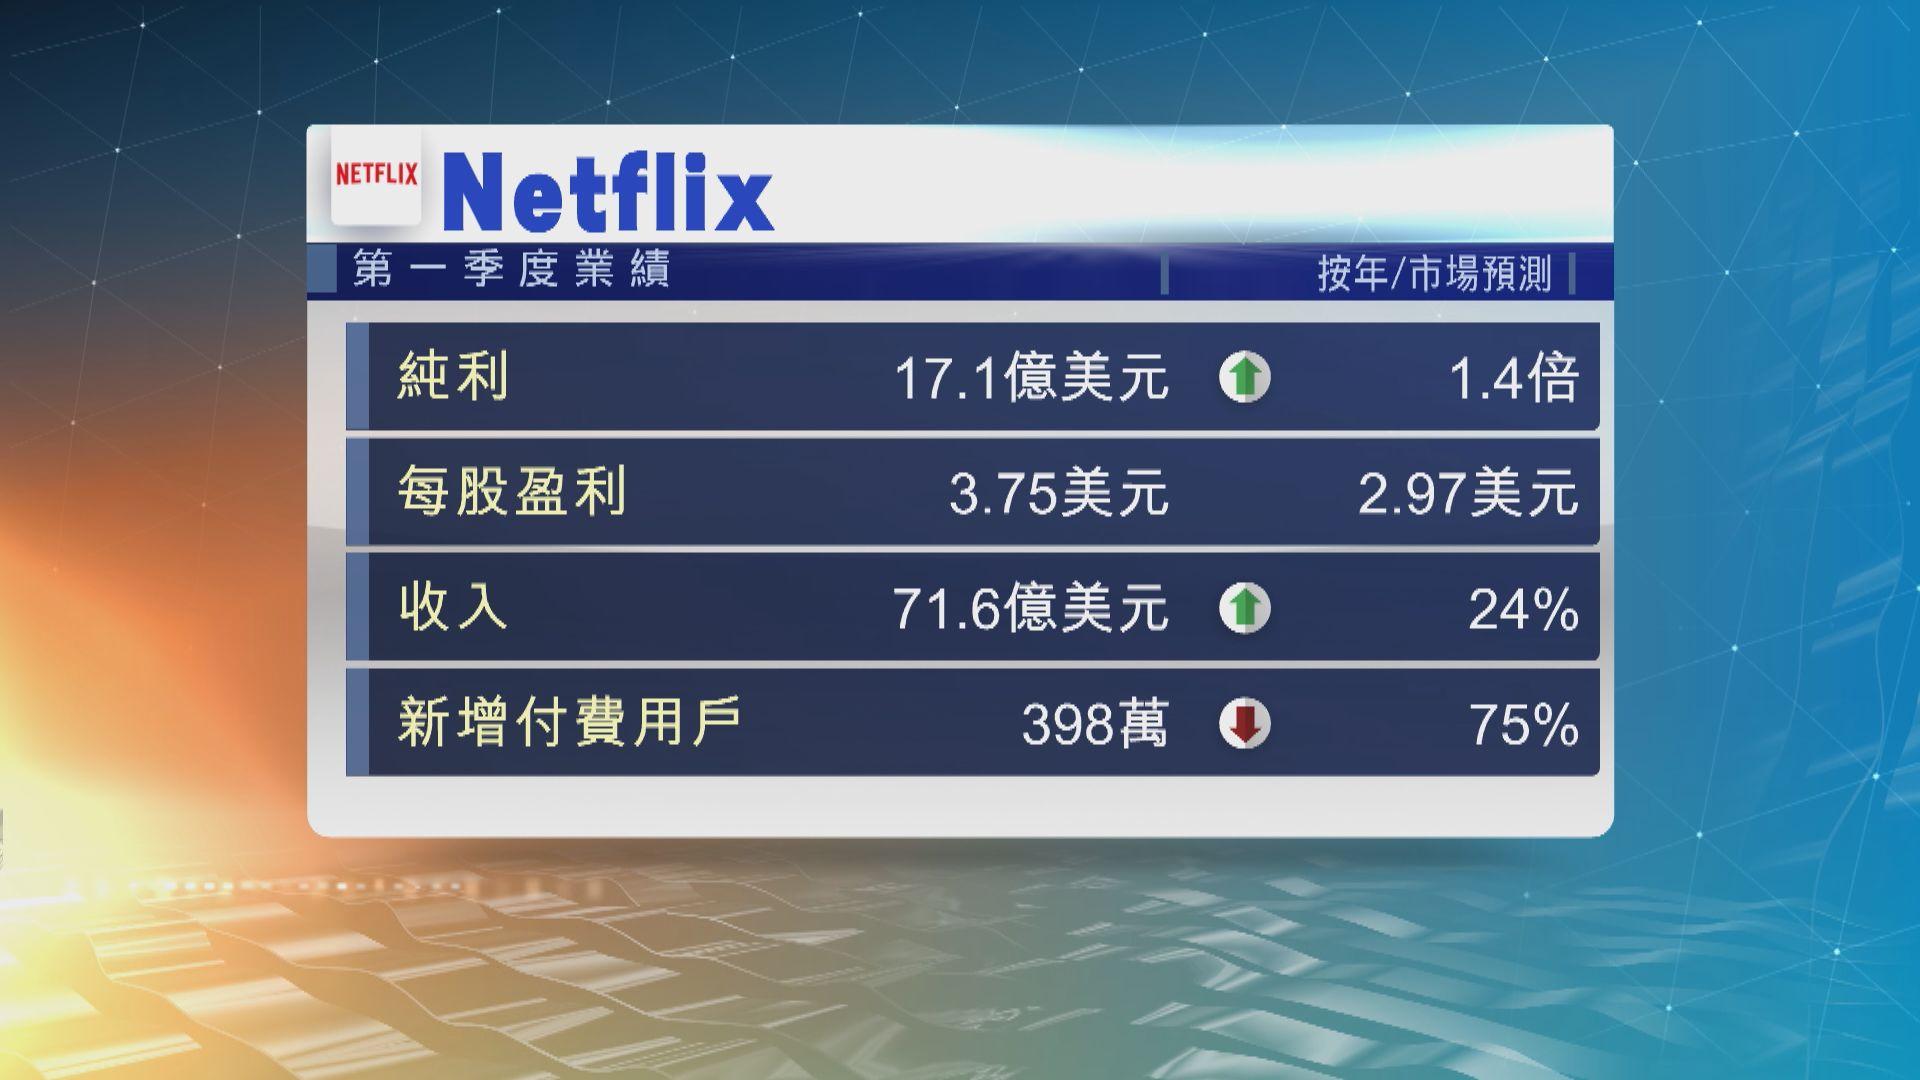 Netflix上季新增付費用戶遠遜預期 盤後股價逾挫10%